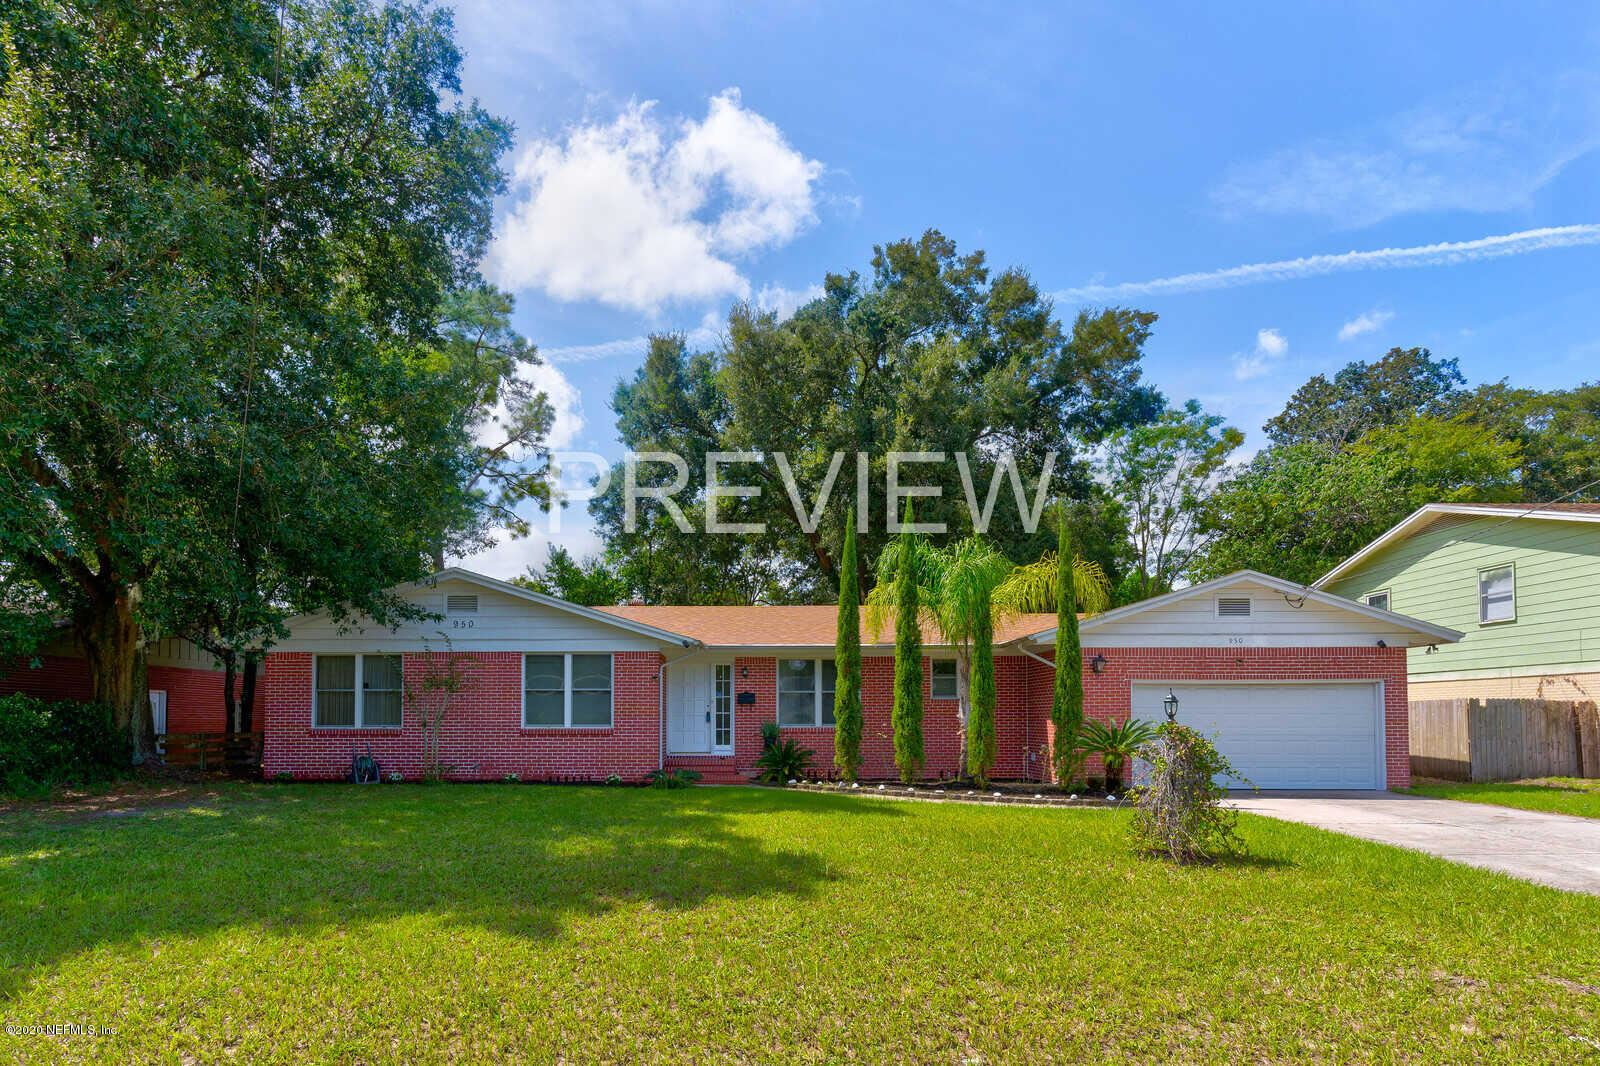 950 TOWNSEND BLVD, Jacksonville, FL 32211 - MLS#: 1074240